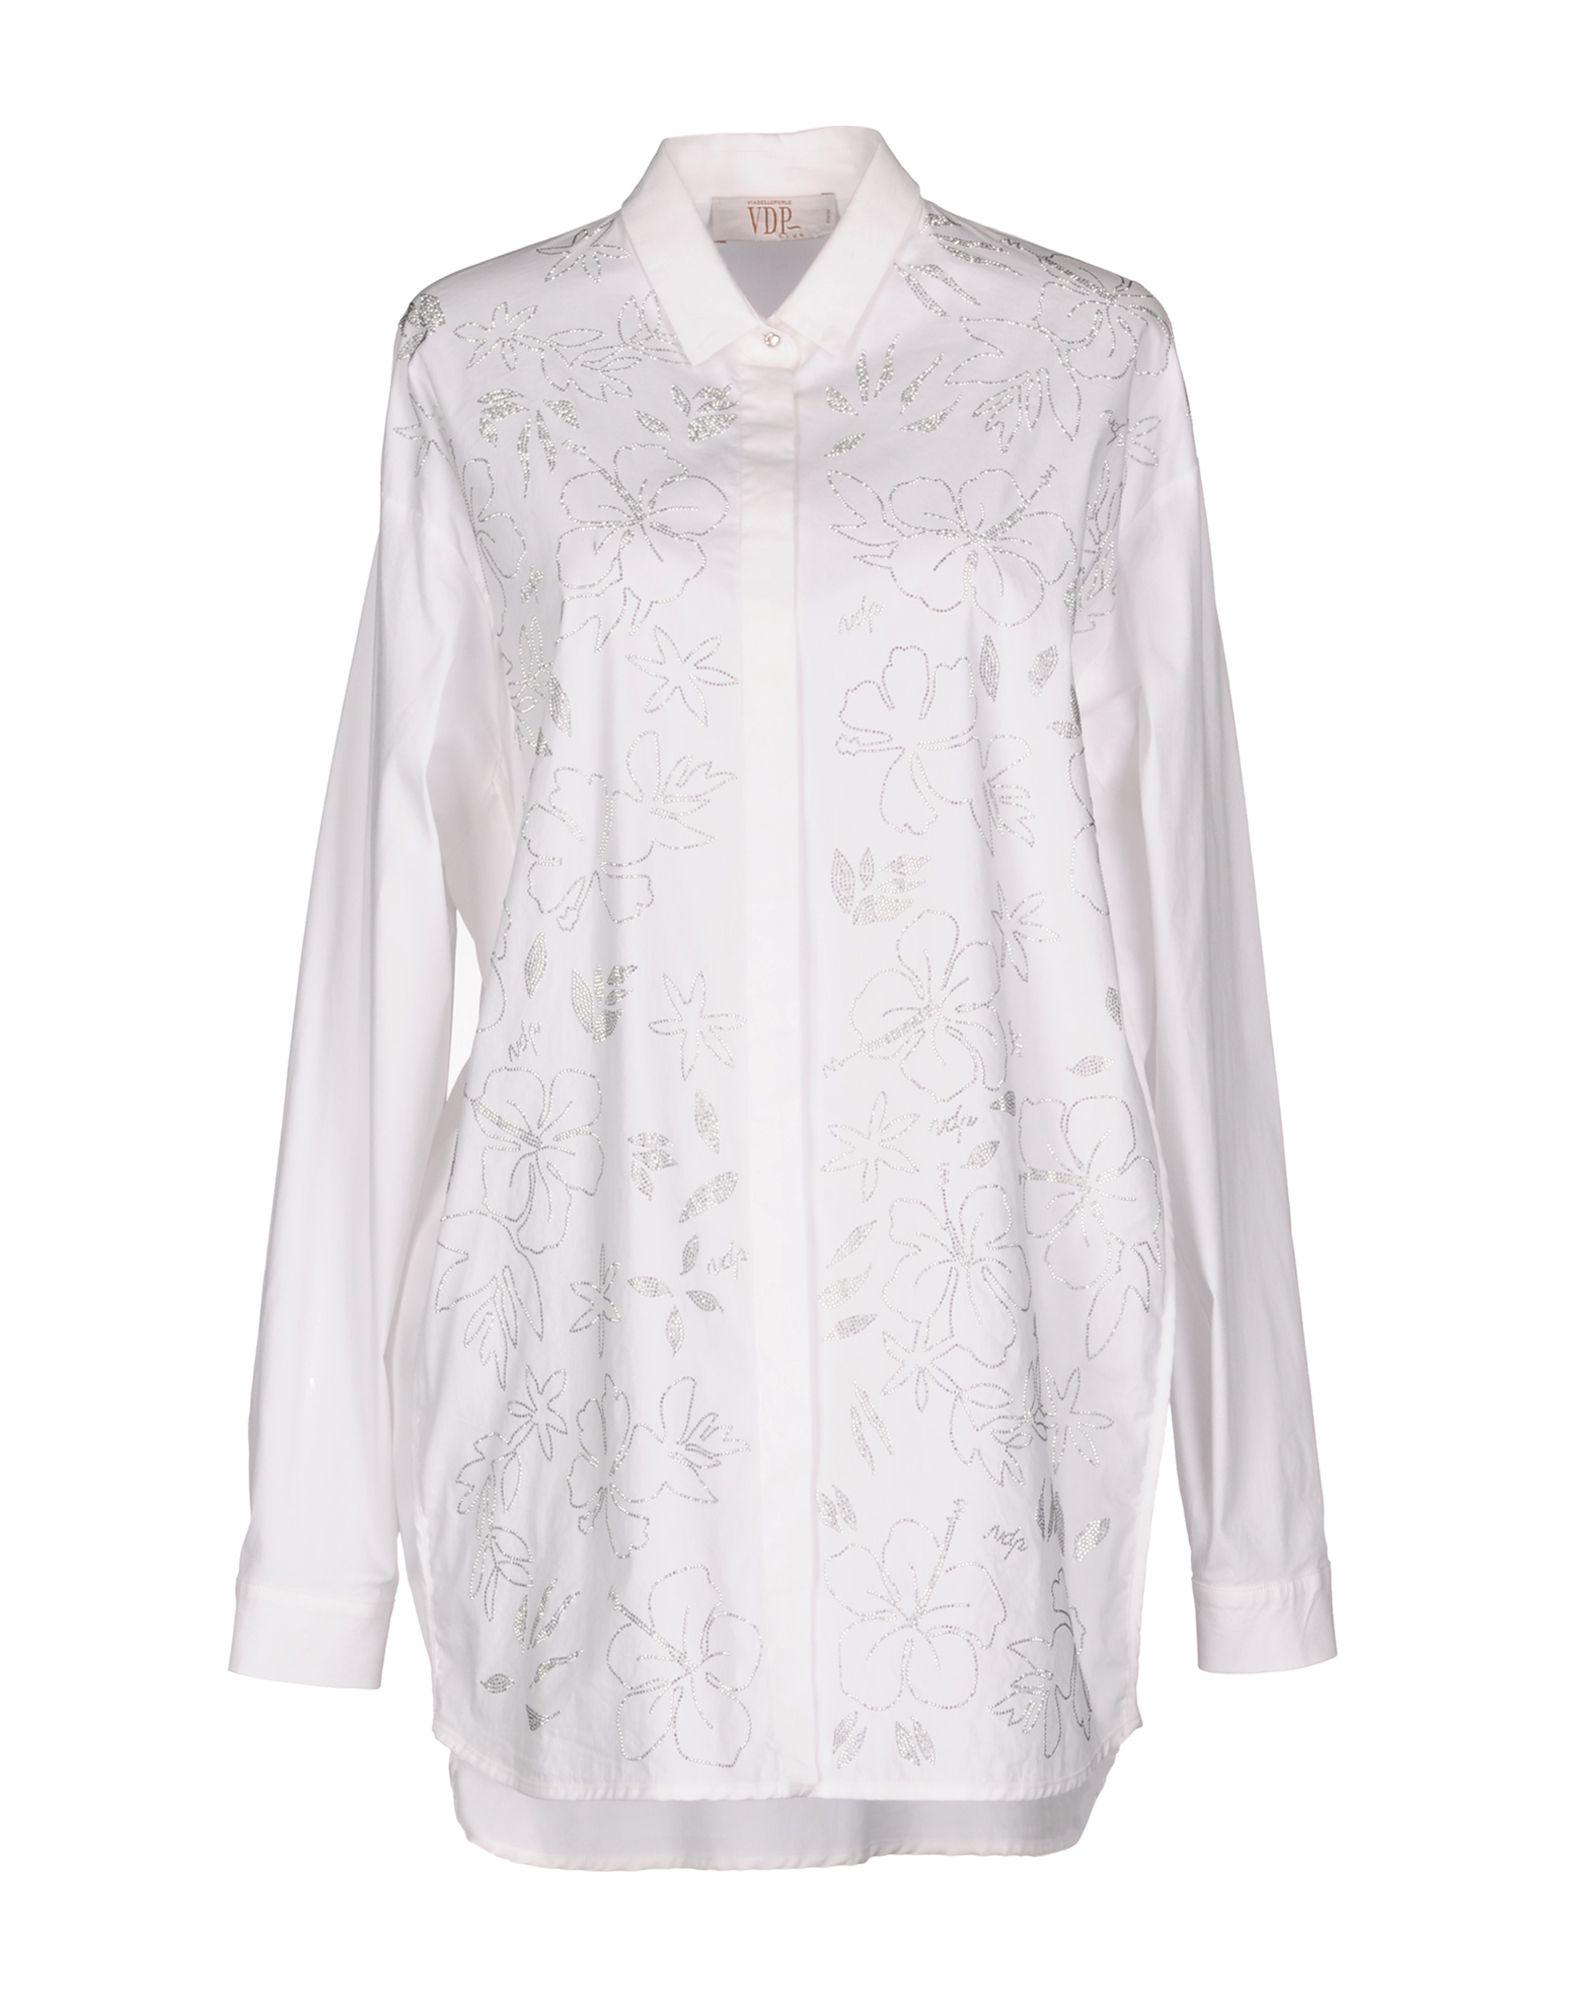 Camicie E Bluse Tinta Unita Vdp Club Donna - Acquista online su OceDh